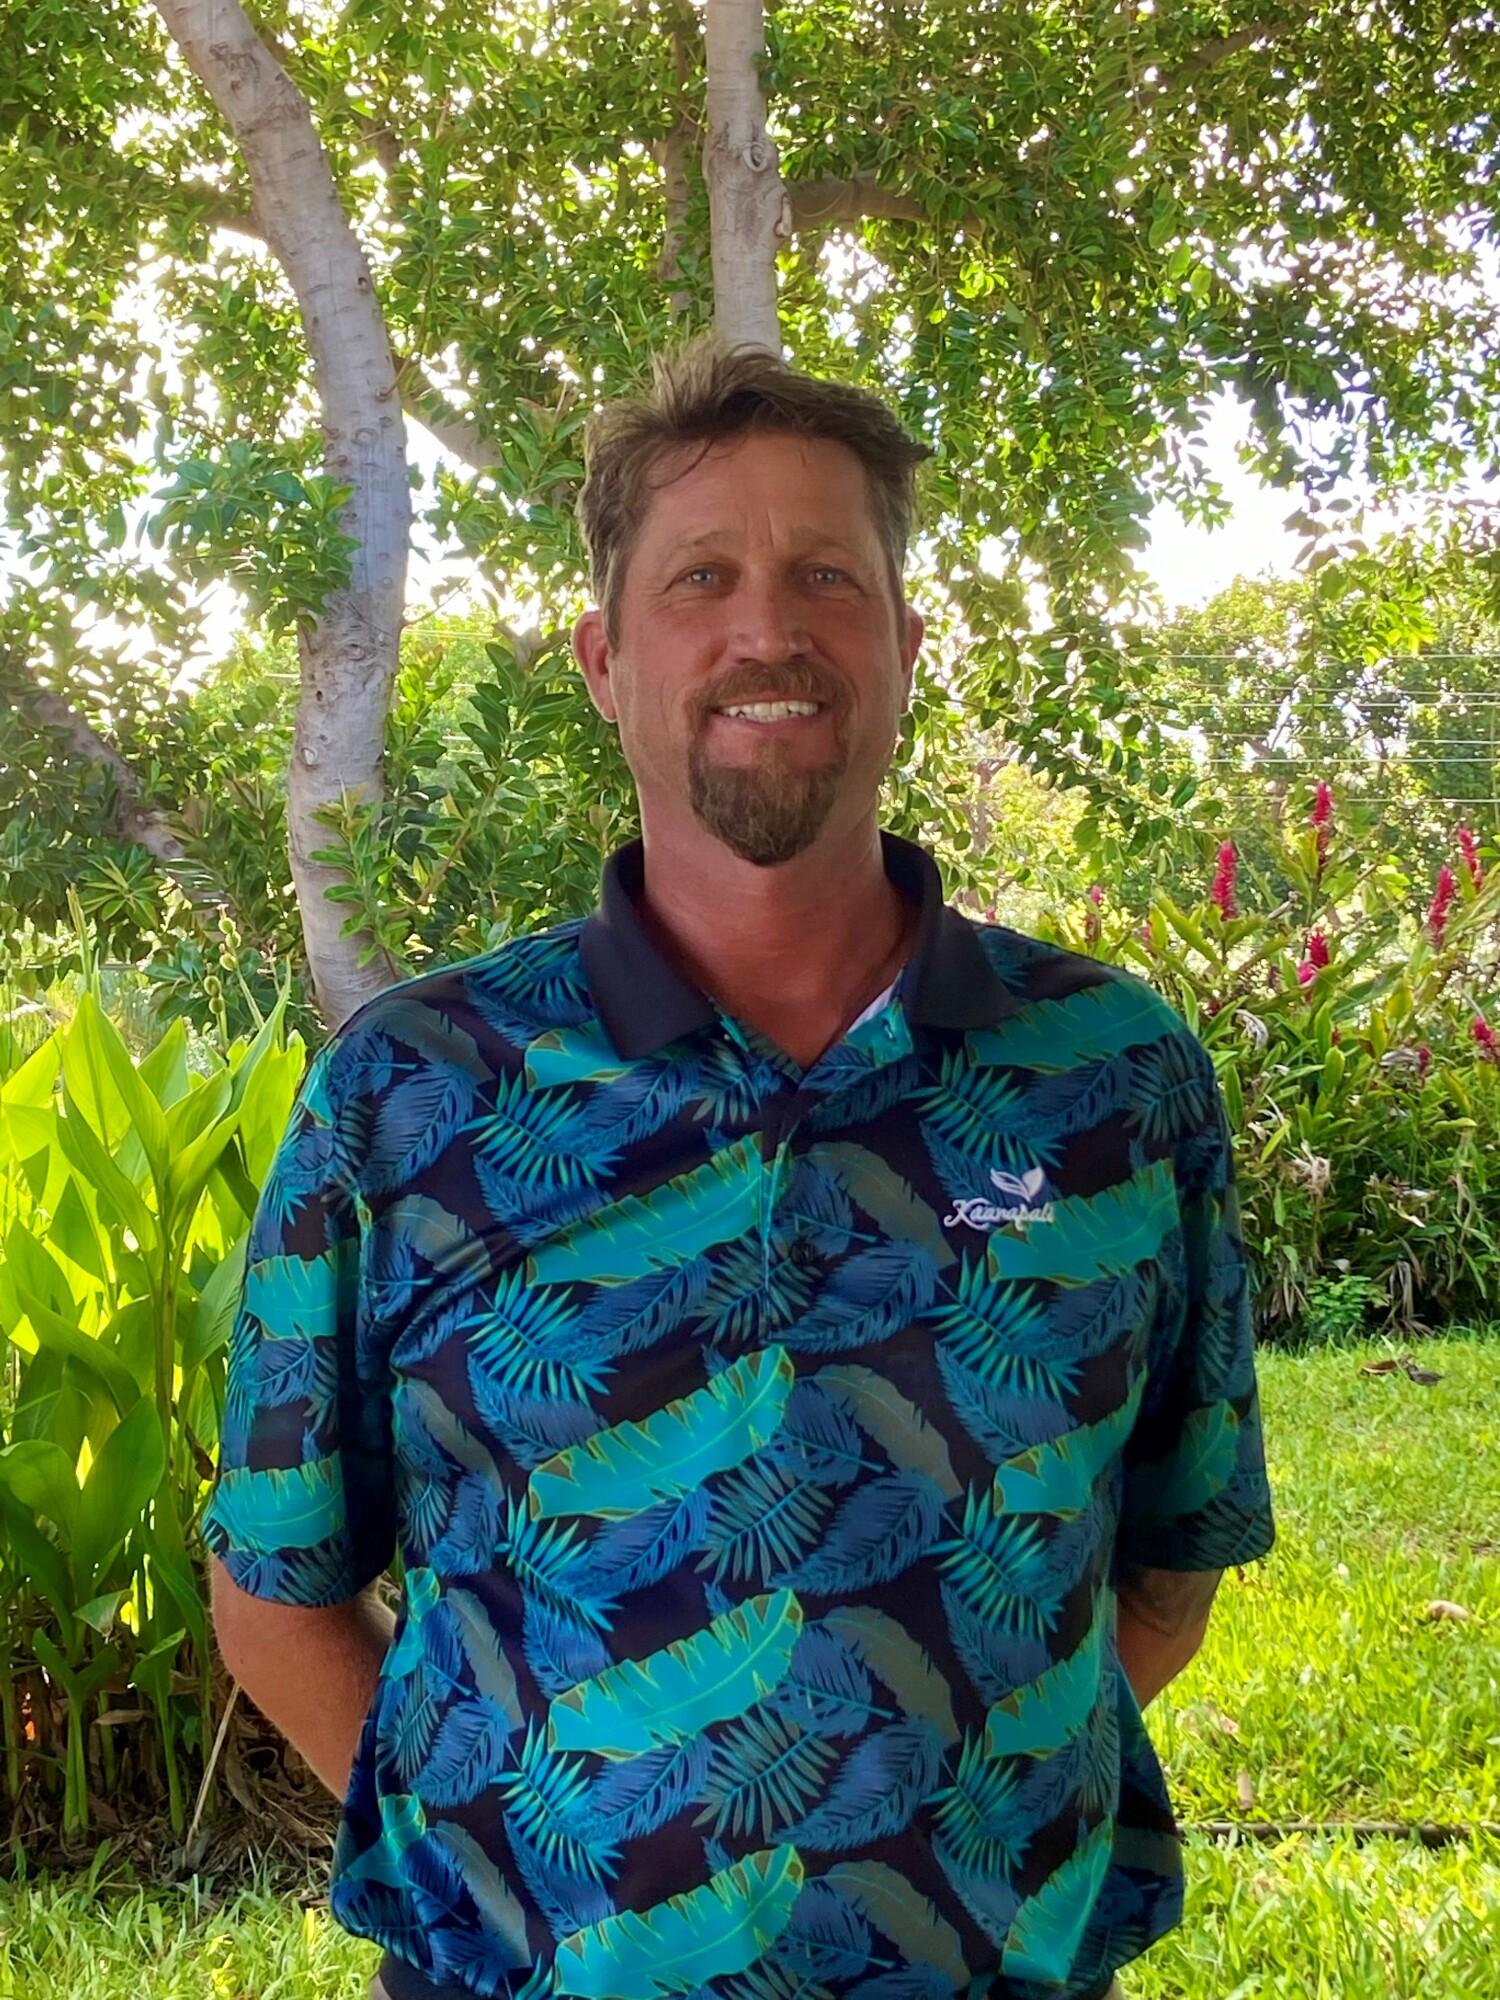 Todd Allen Senior Superintendent at Ka'anapali